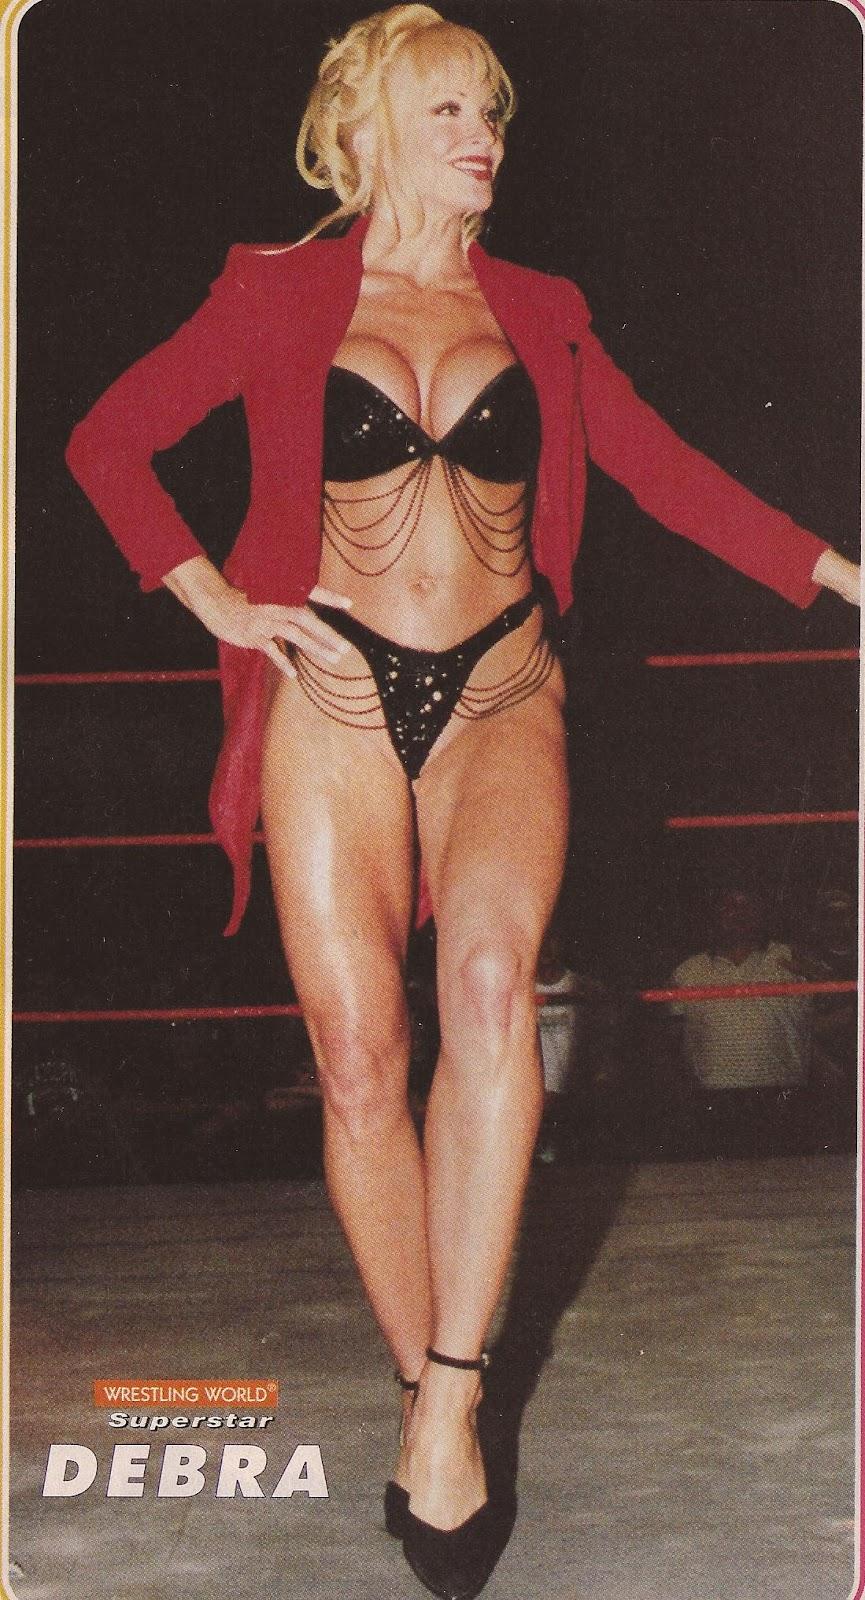 Classic Wrestling World Photos Debra Marshall Photos